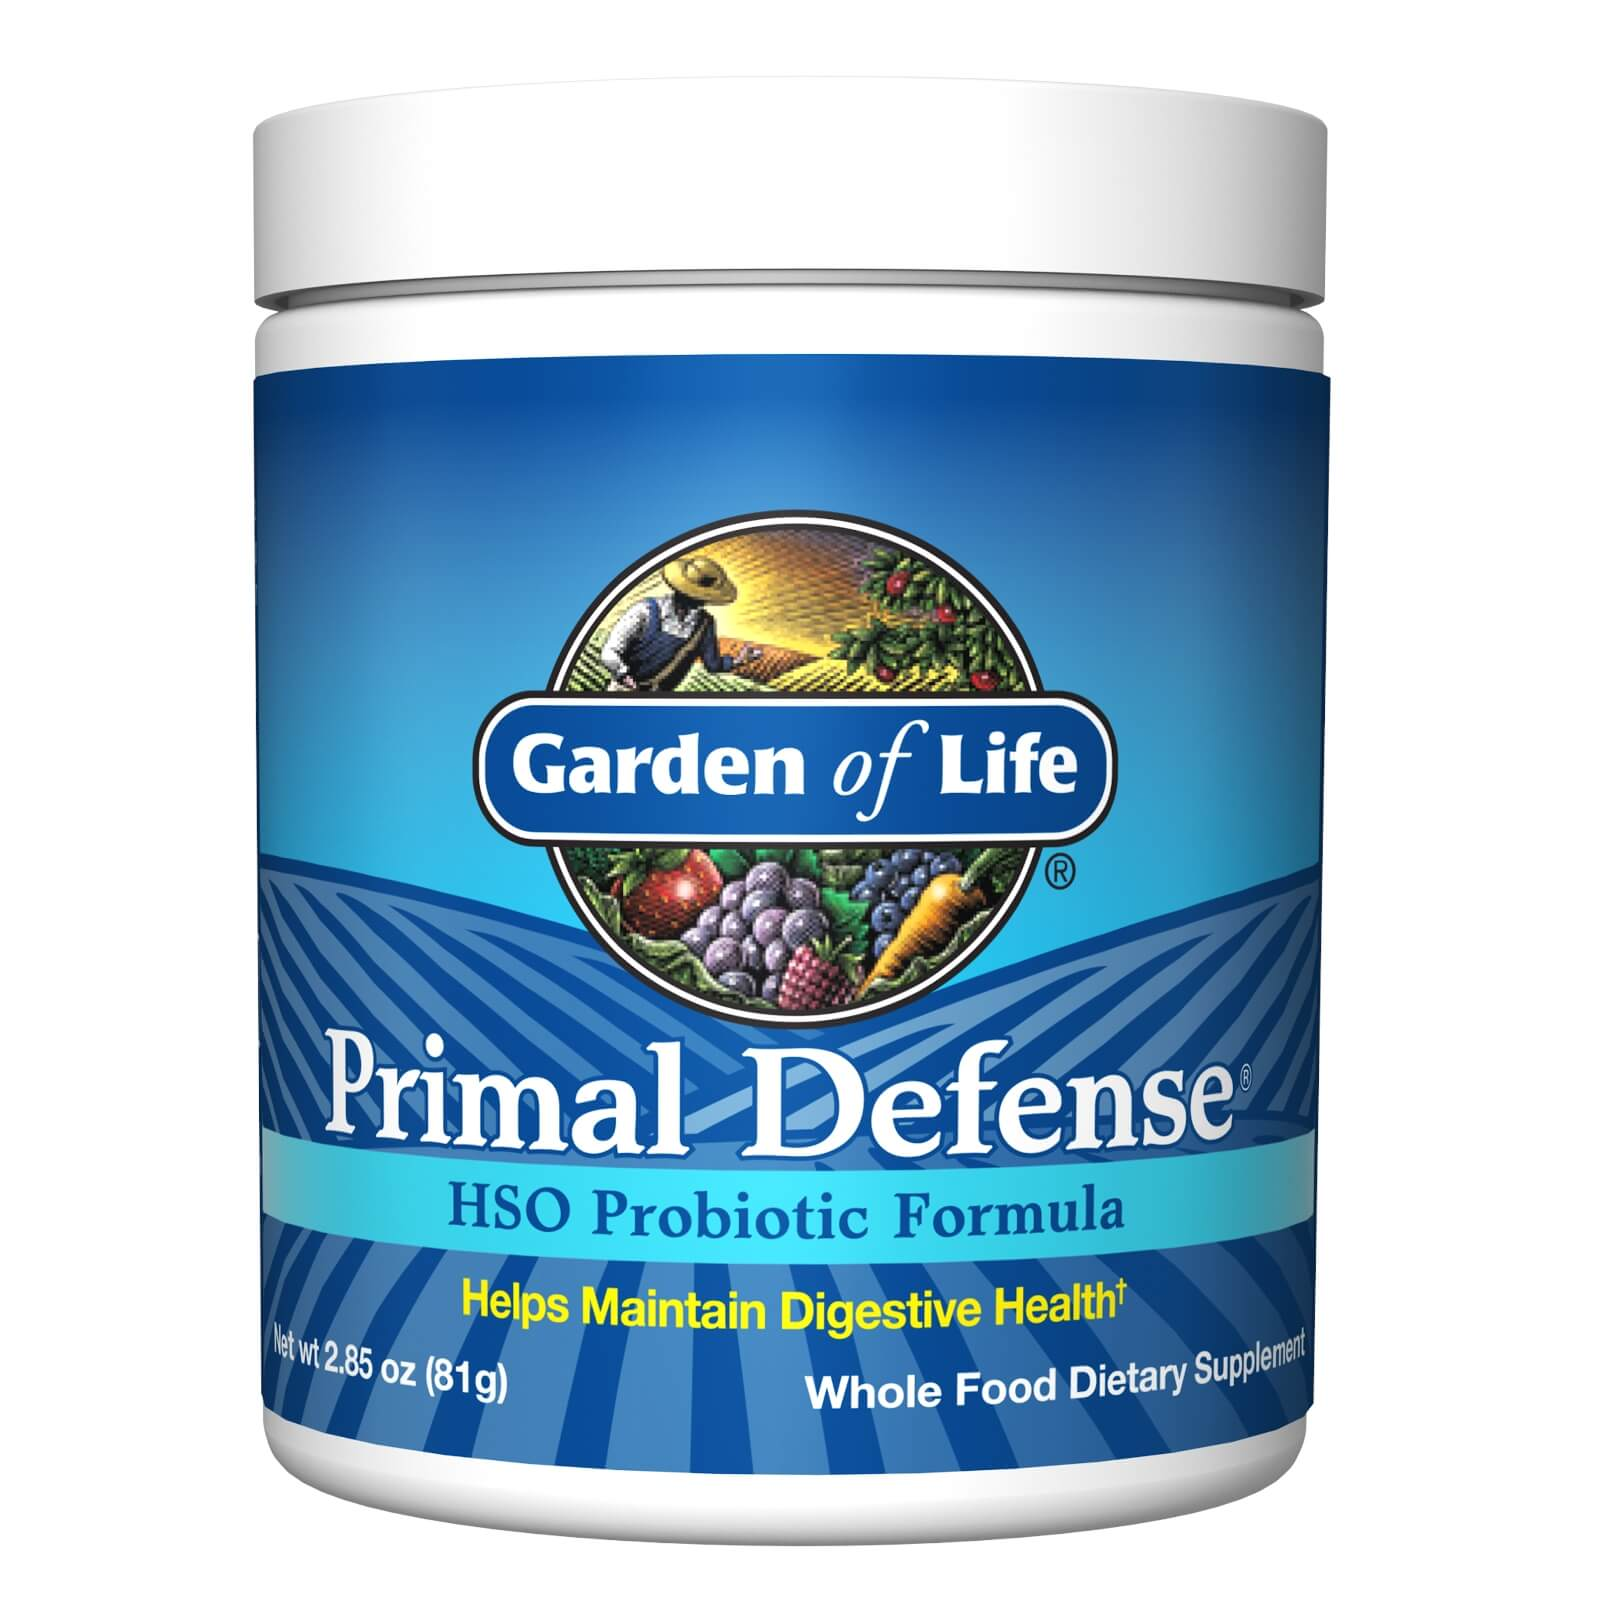 Garden of Life Primal Defense HSO Formula - 81g